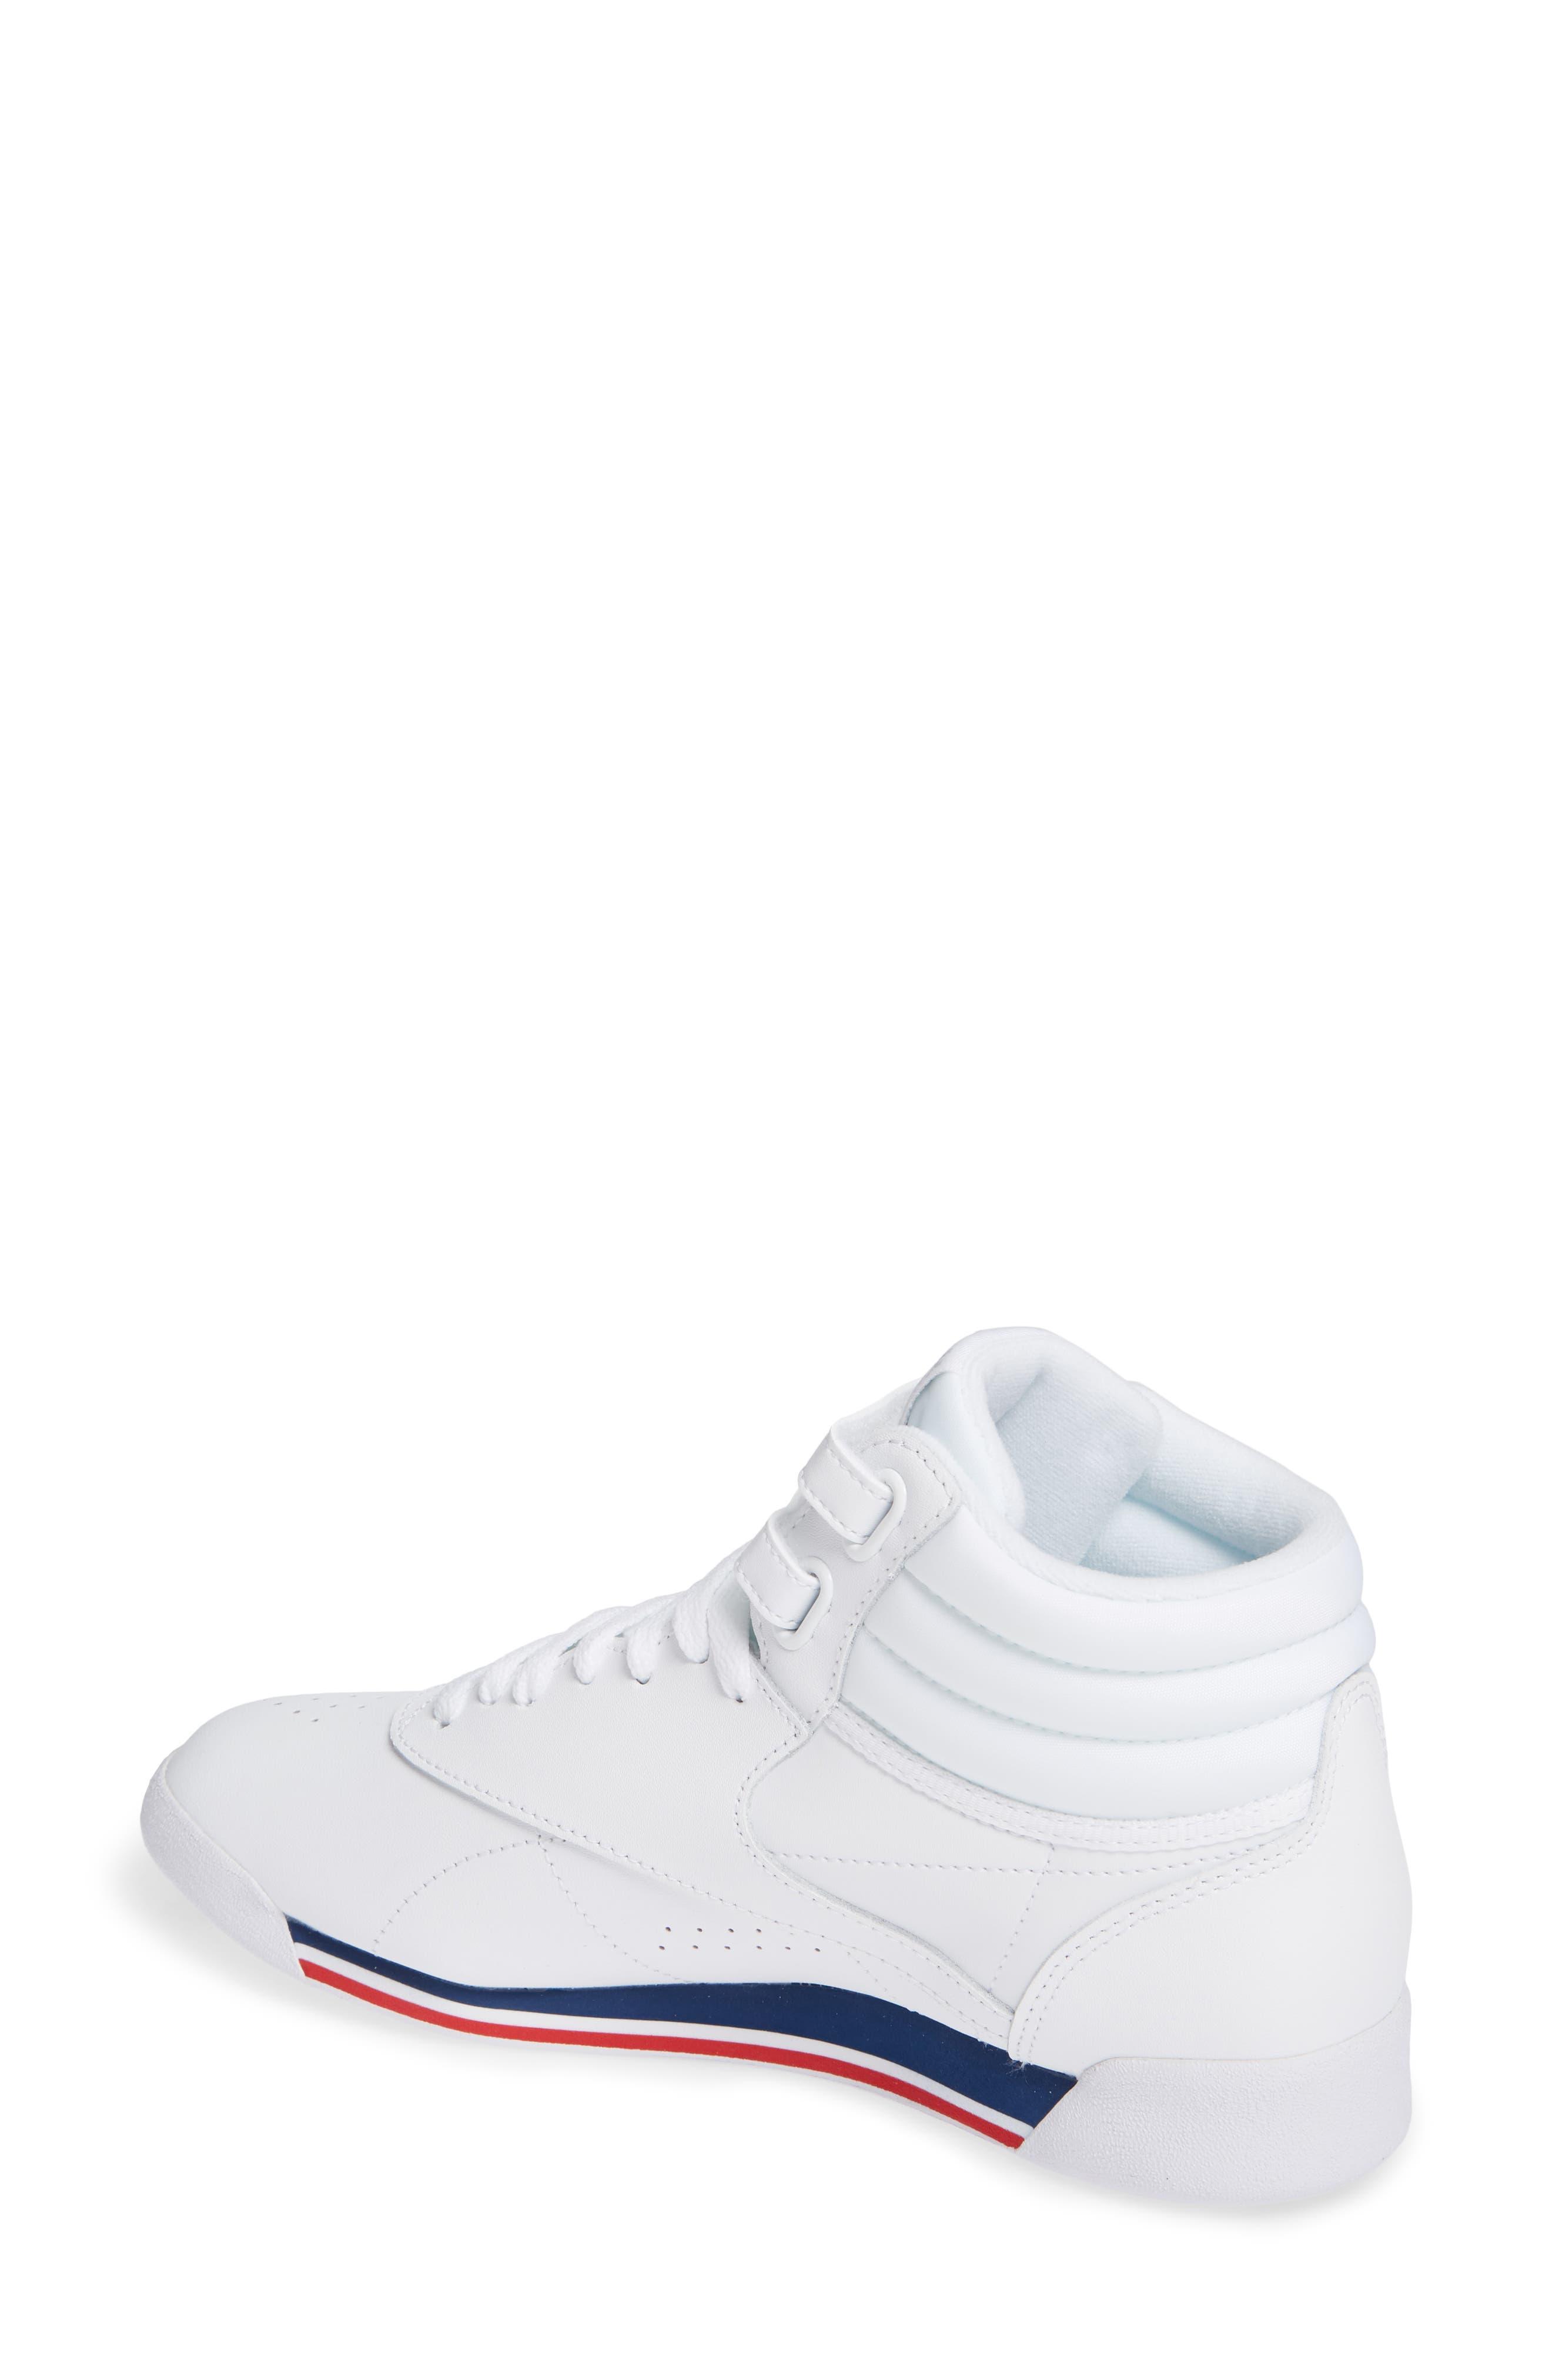 Freestyle Hi Sneaker,                             Alternate thumbnail 2, color,                             101